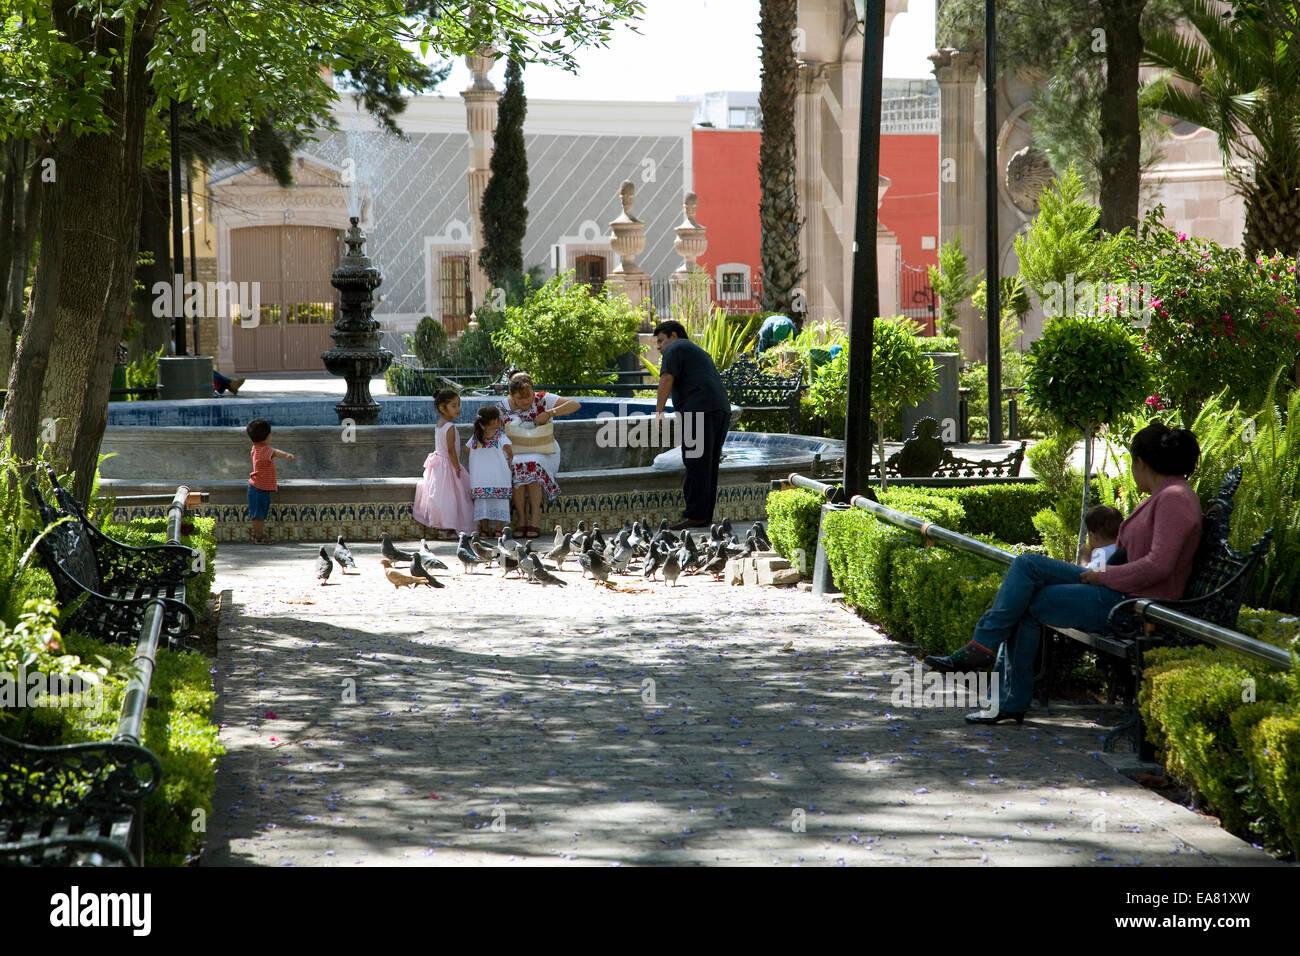 Jardin De La Paz im Stadtteil Barrio del Encino, Aguascaliente ...